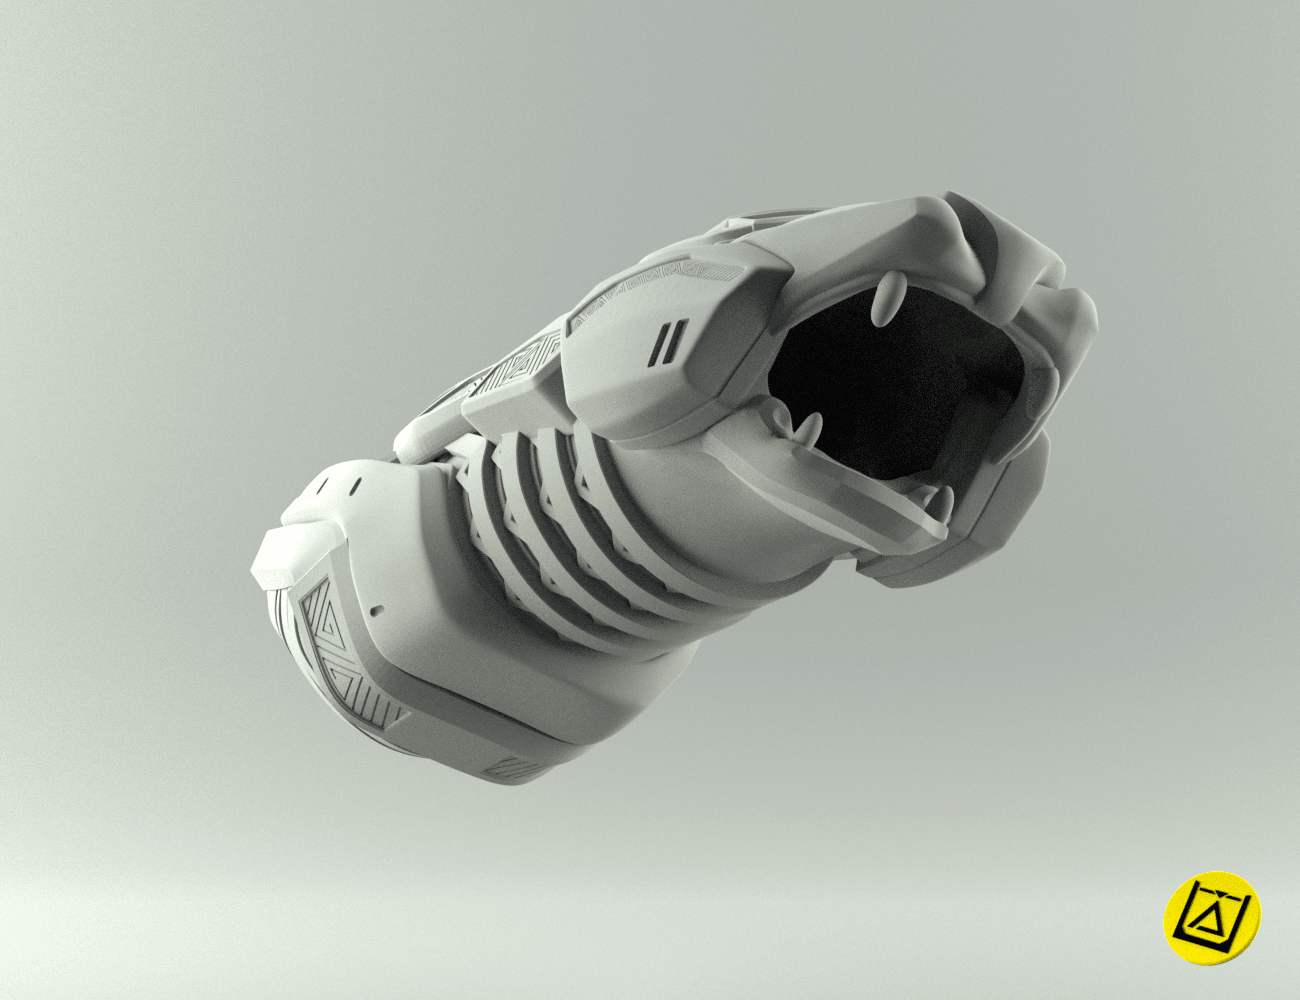 blastersbigrender3.png Download STL file Shuri Vibranium Blasters • 3D print model, 3D-mon